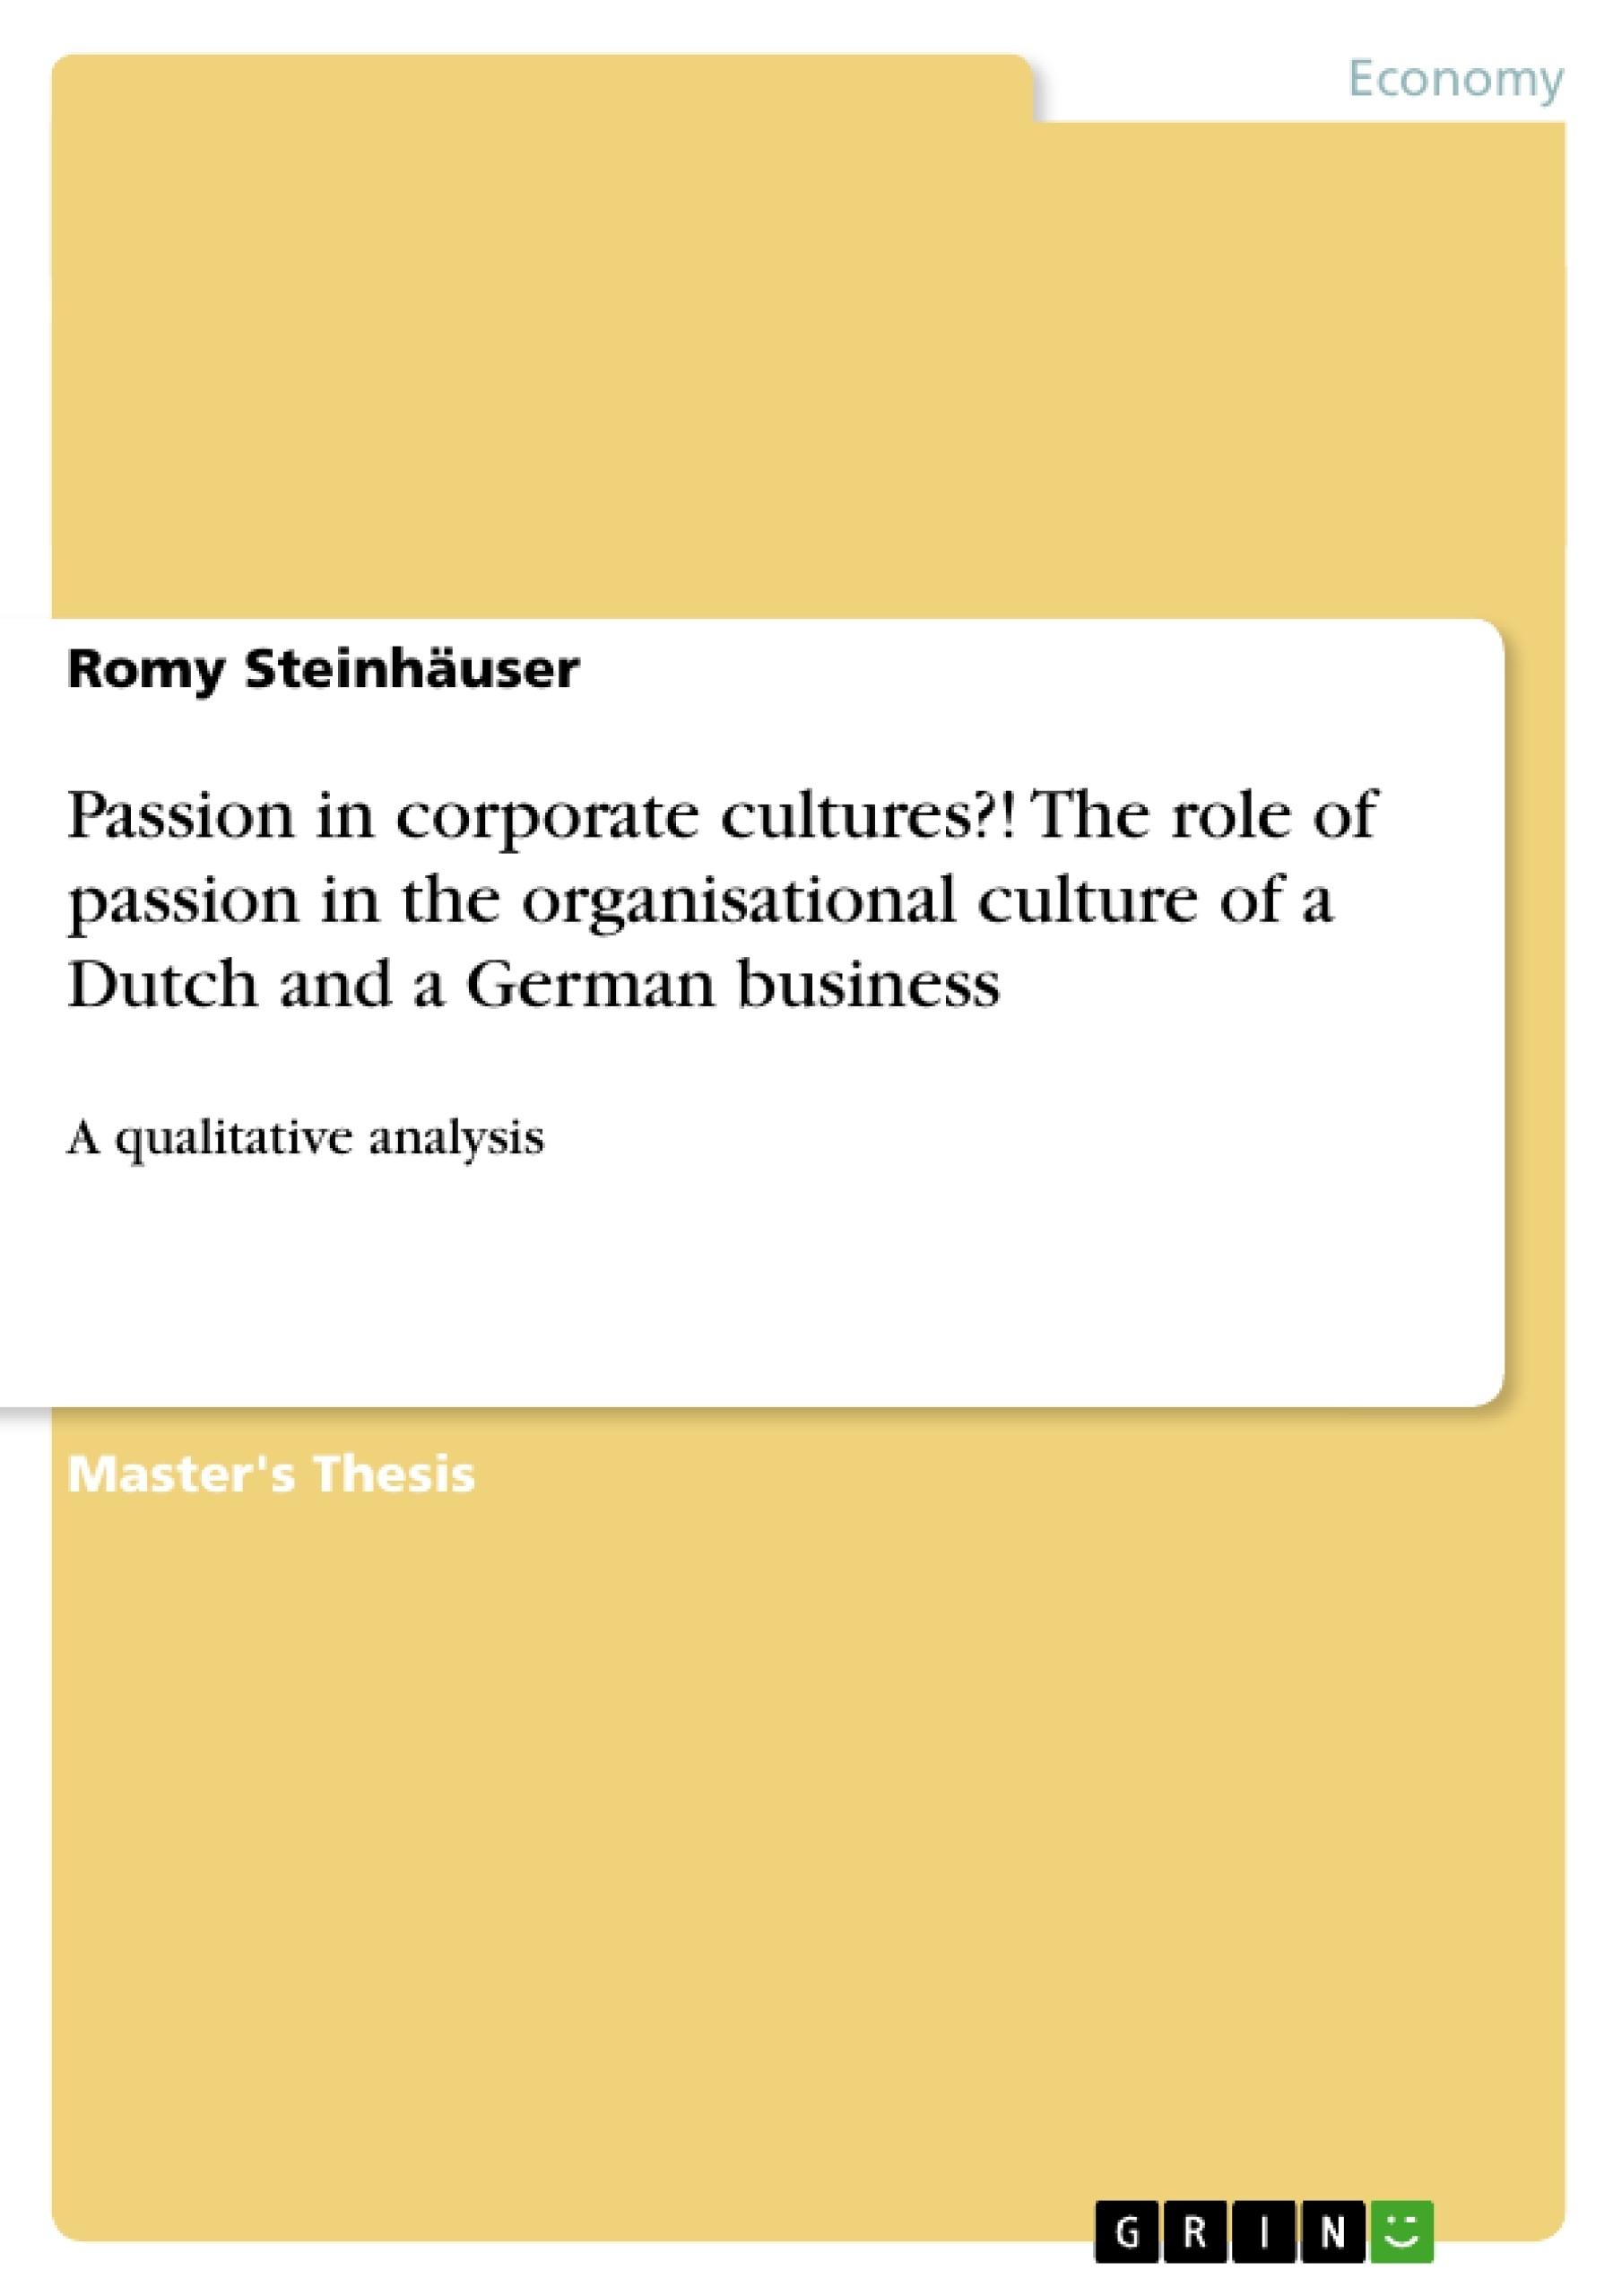 term paper on corporate culture